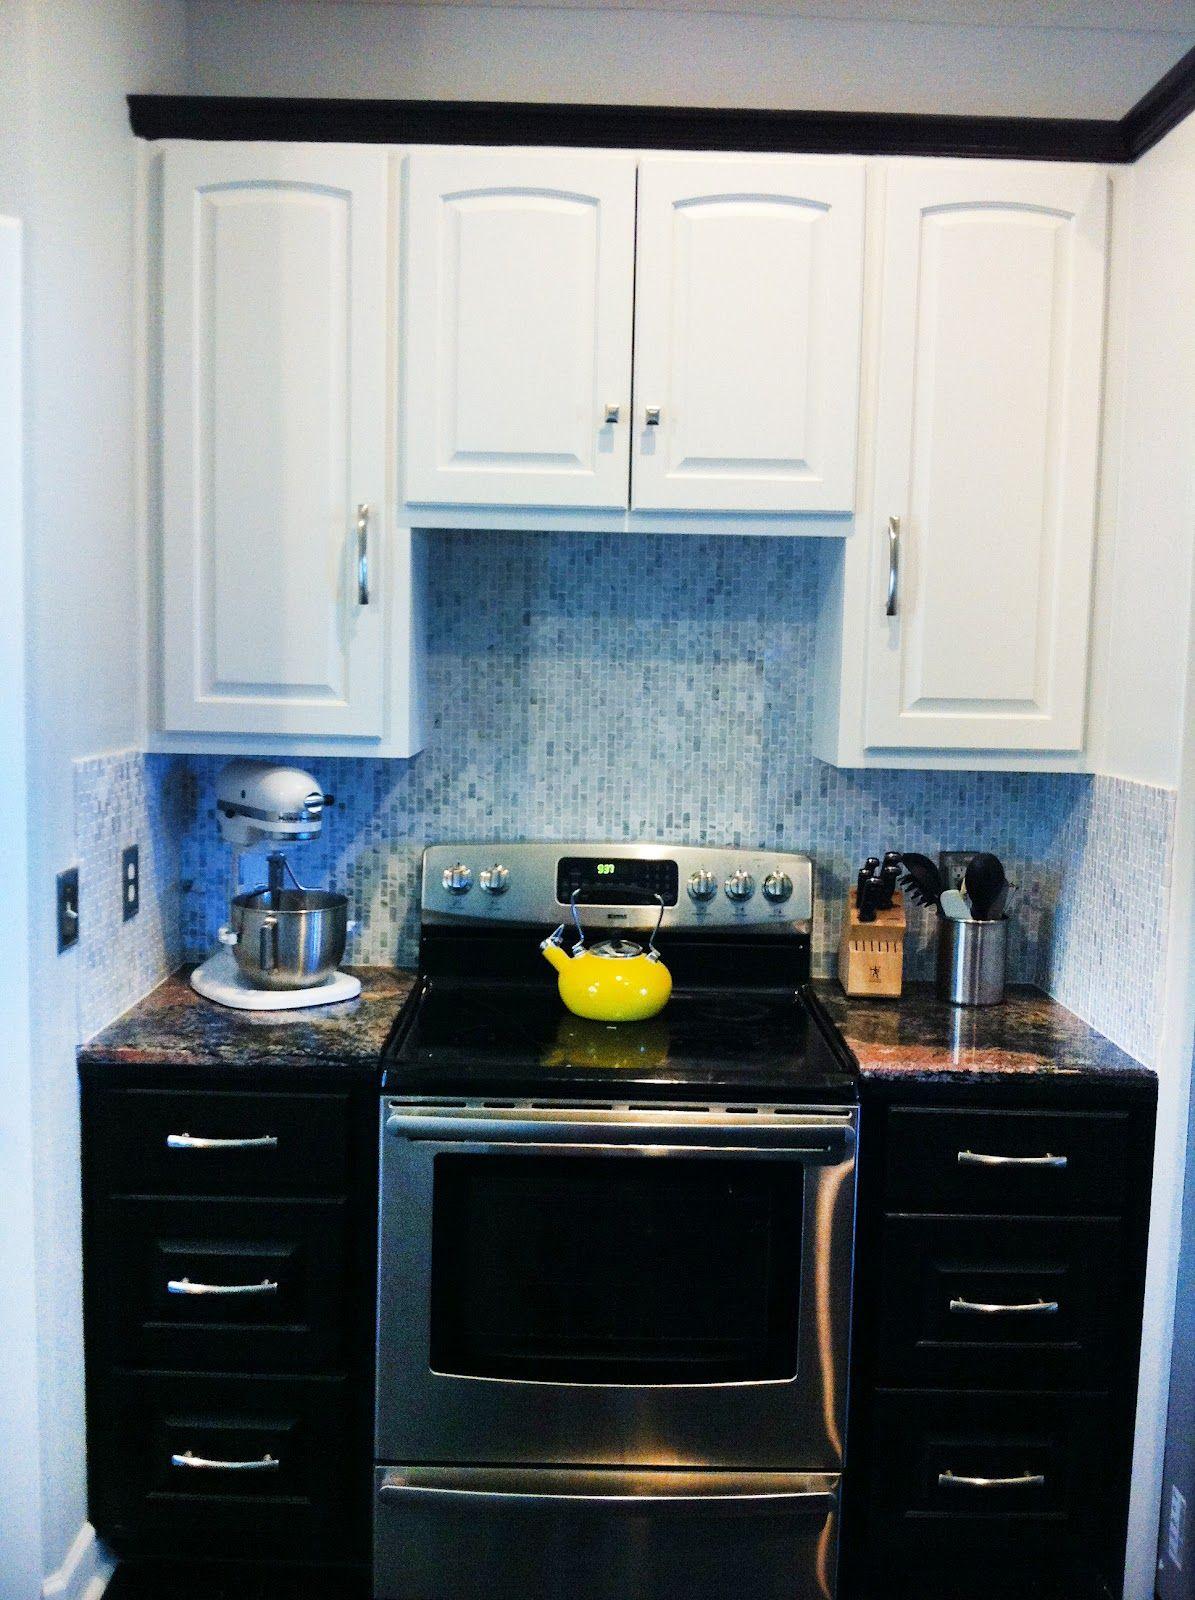 Black And White Kitchen Cabinets Tuxedo Kitchen Google Search Kitchen Amy S Kitchen Kitchen Cabinets